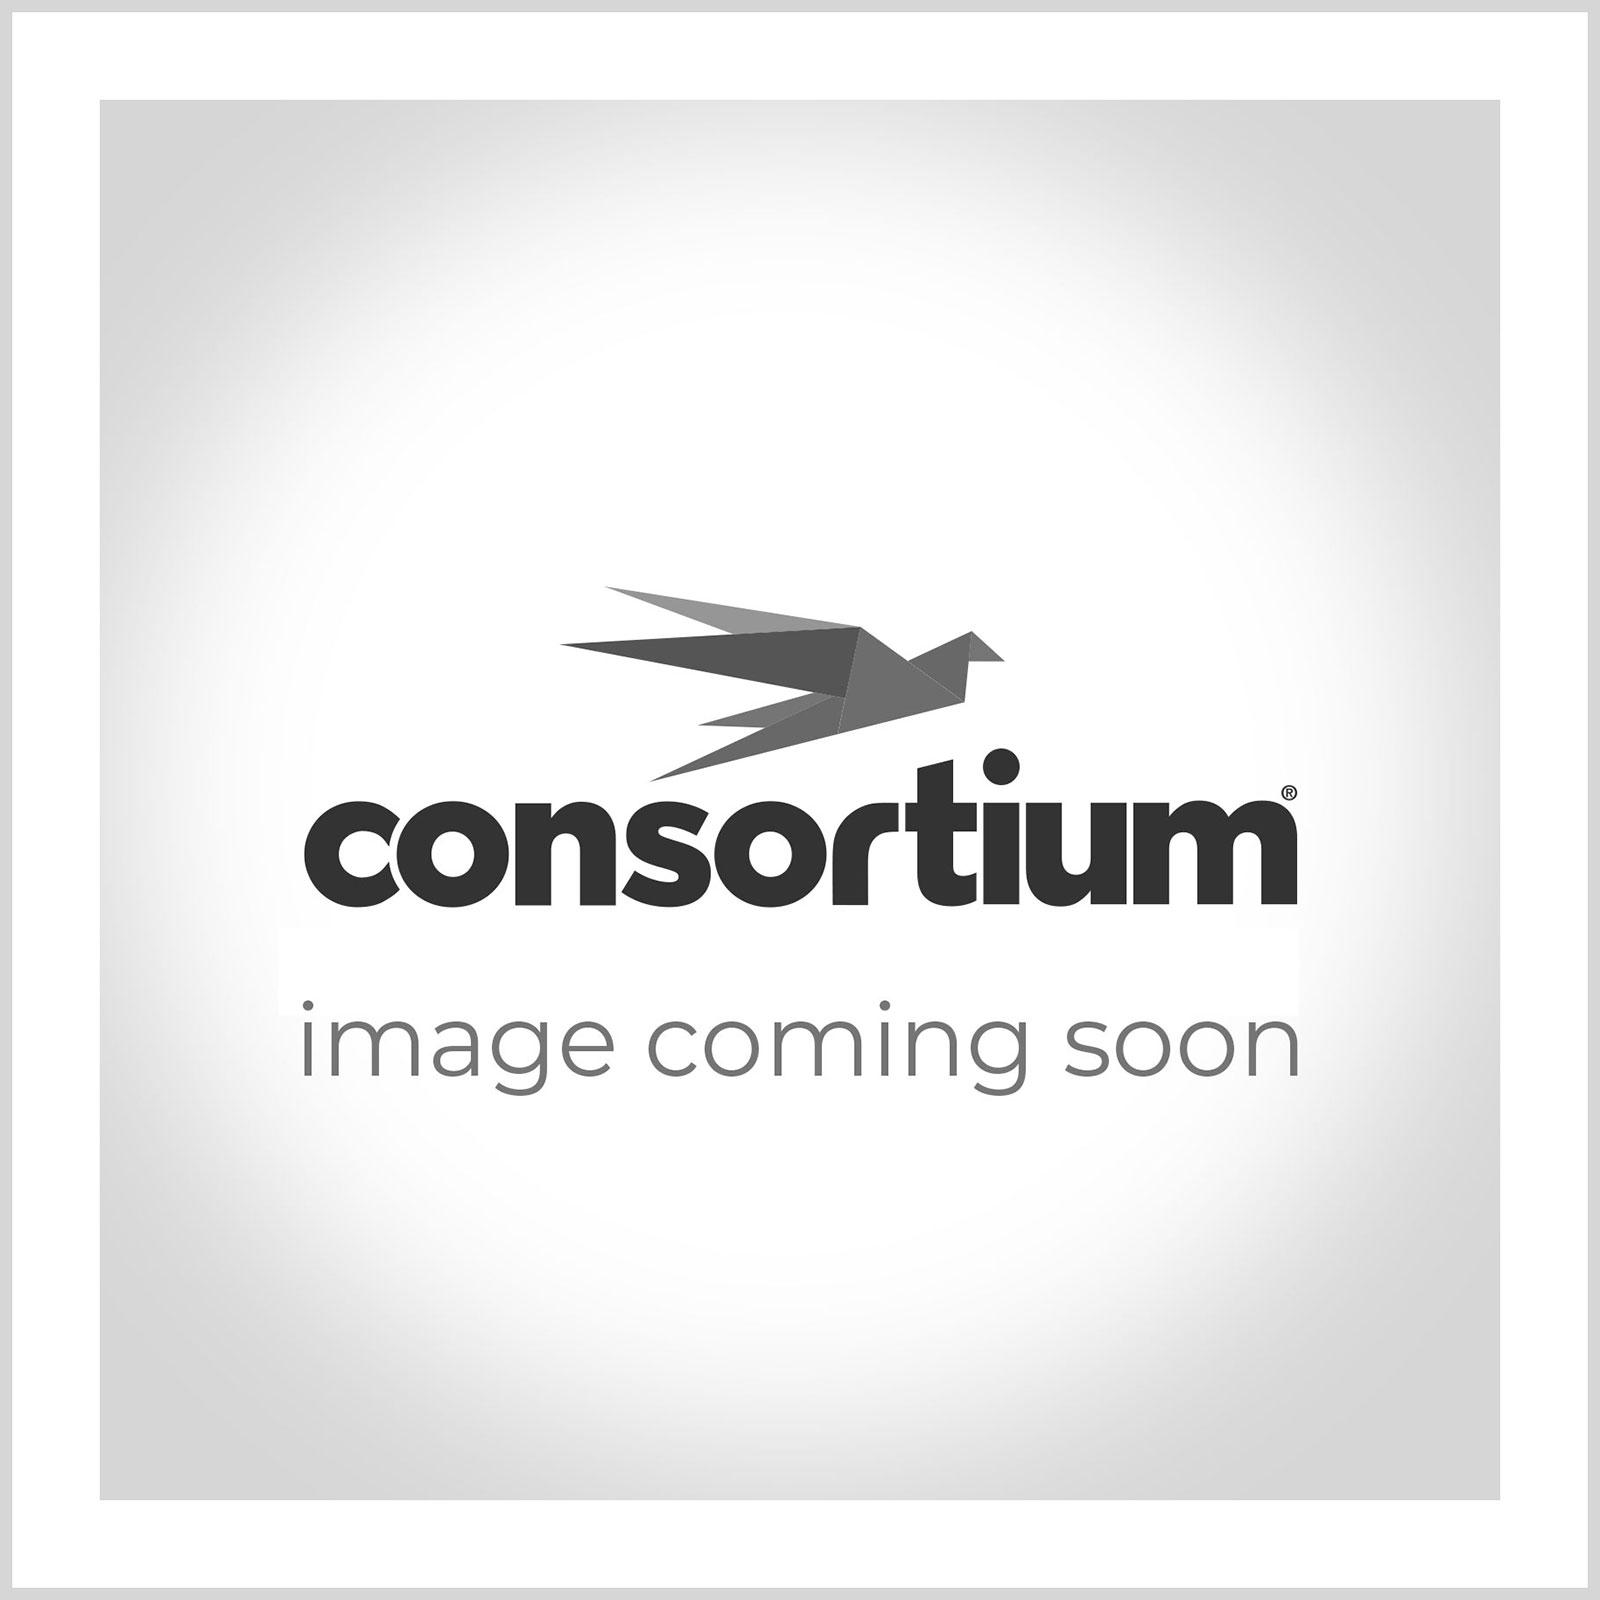 Metalliform NP Chairs